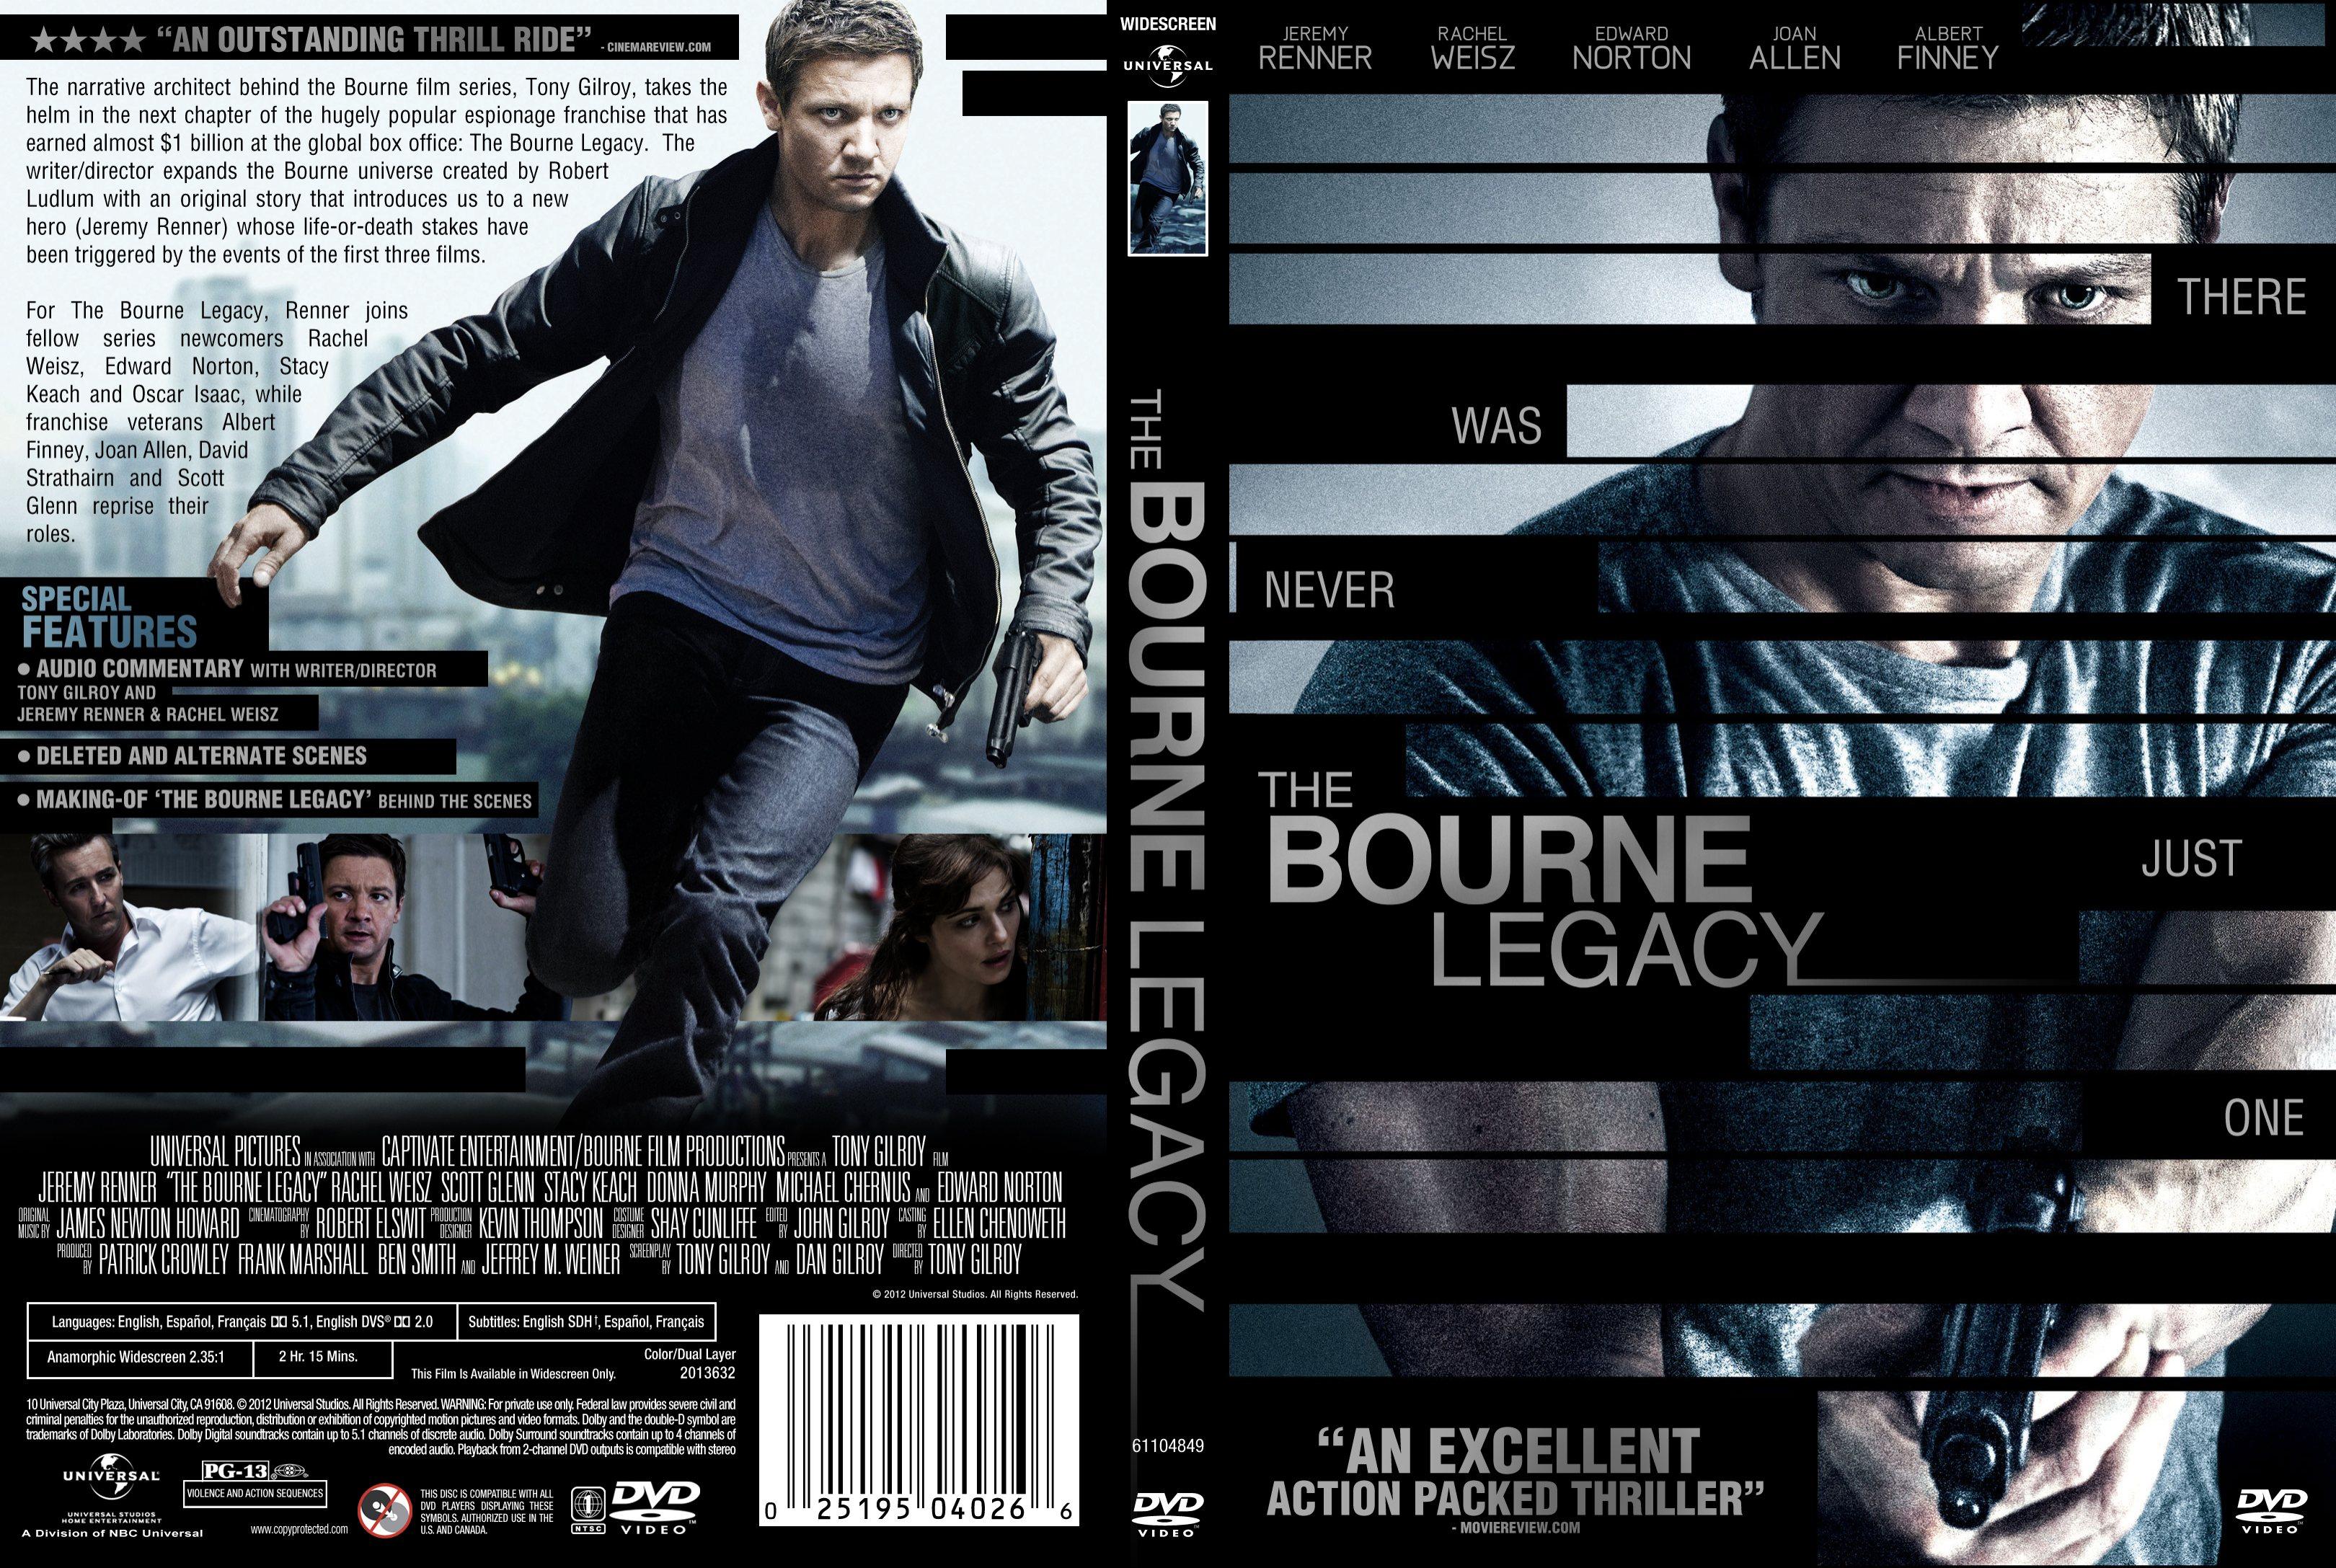 Covers Box Sk The Bourne Legacy 2012 Imdb Dl High Quality Dvd Blueray Movie